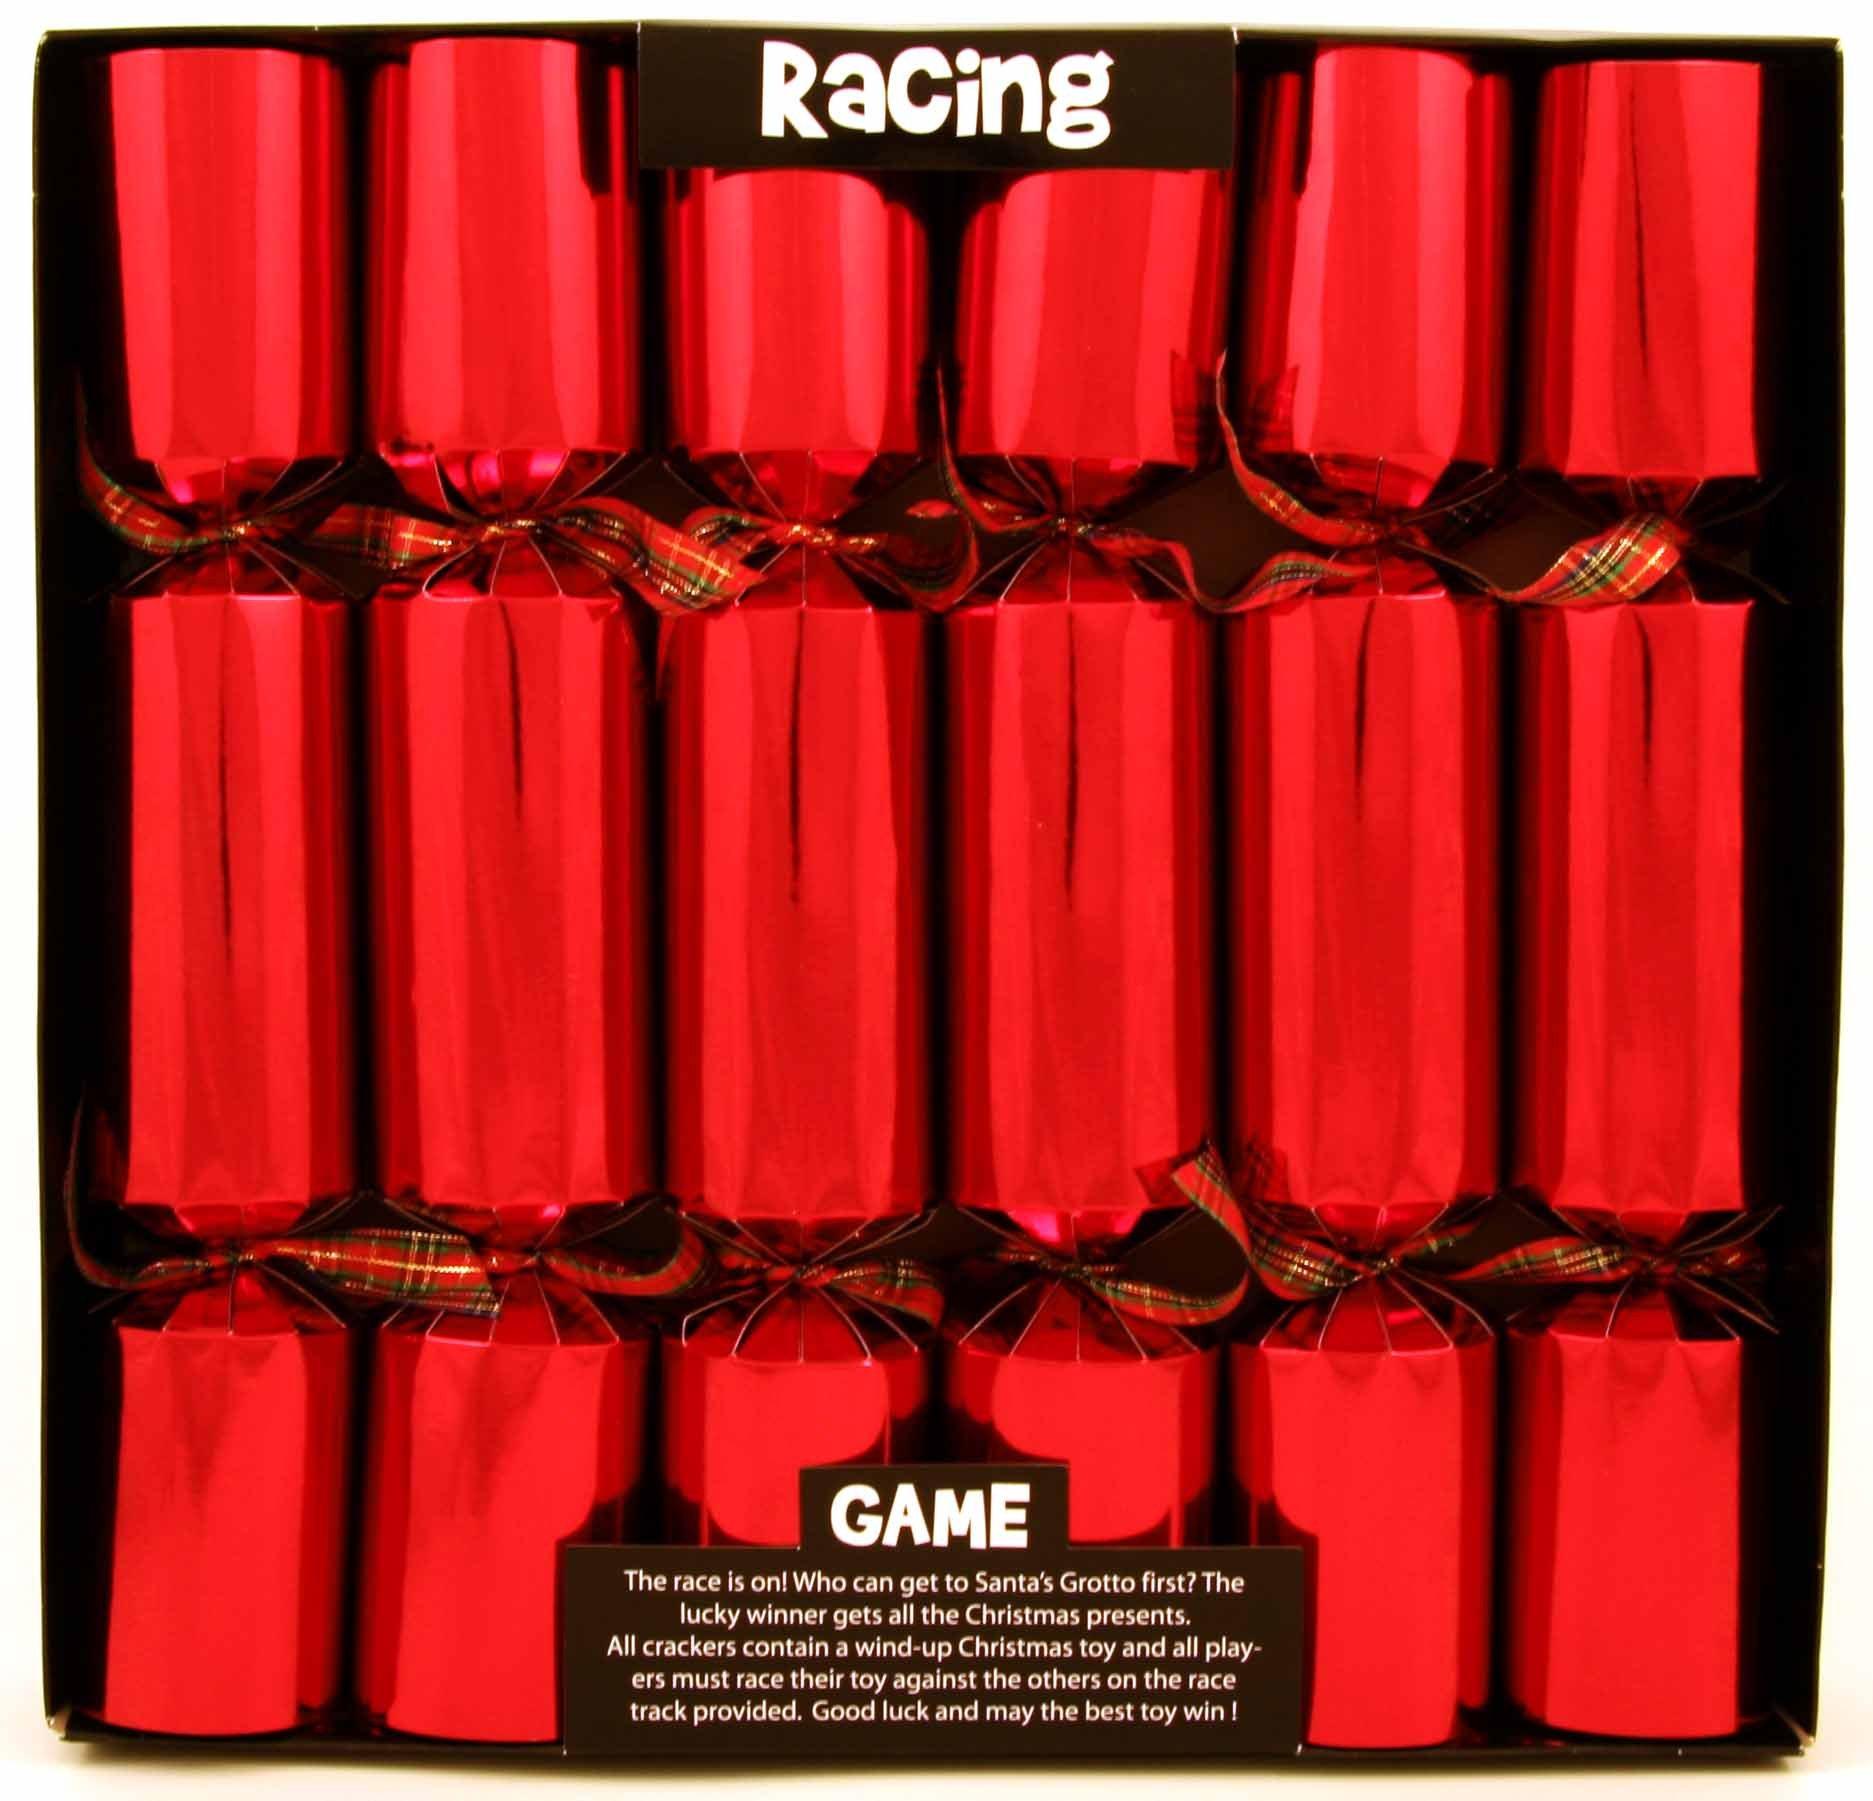 Kuckoo Crackers - 6 x 12.5-inch Race to Santa's Grotto Clockwork Christmas Crackers